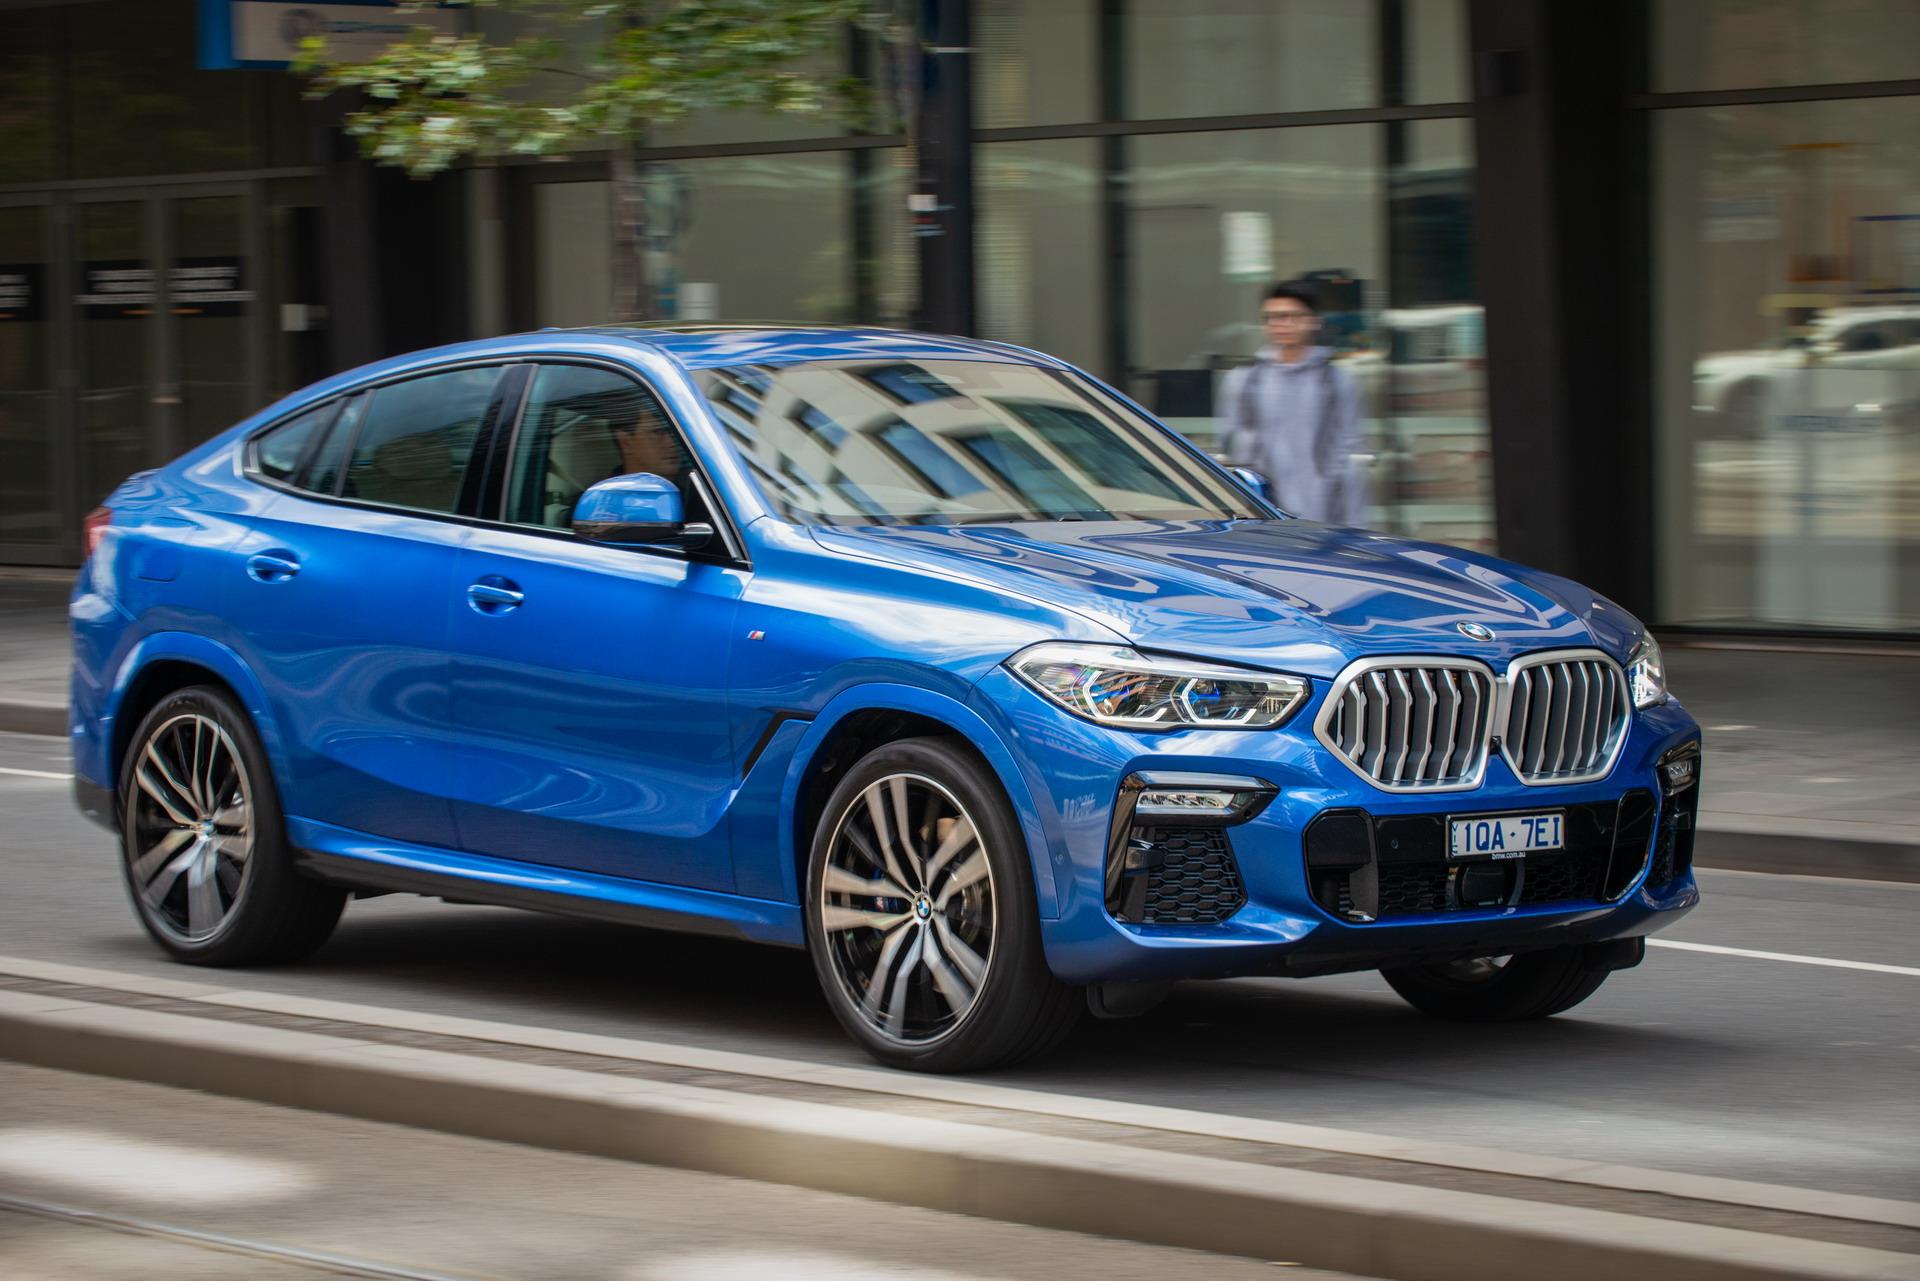 The All New BMW X6 xDrive30d AU Model 6